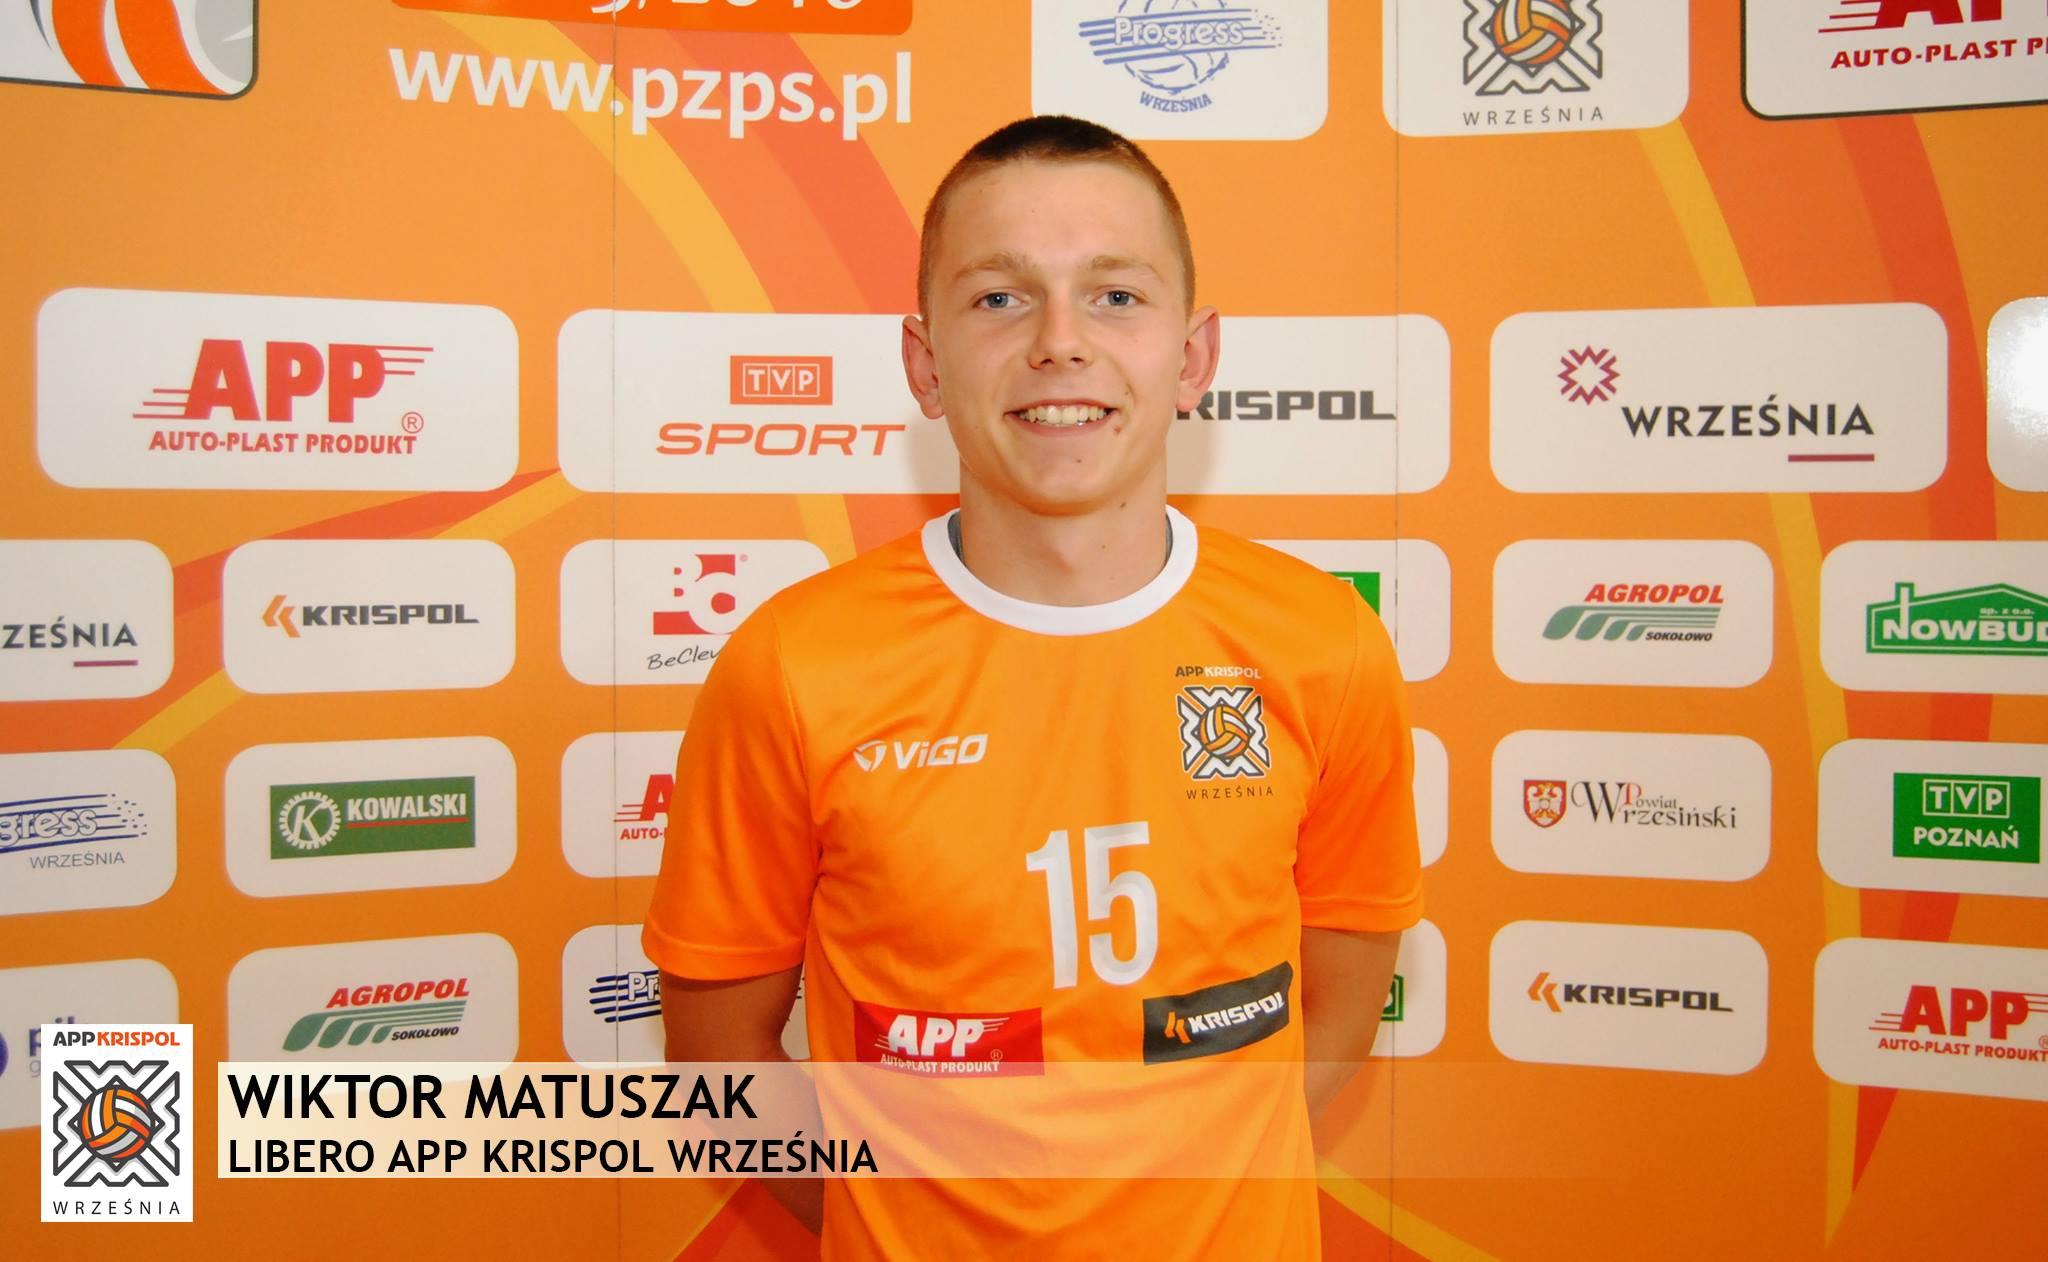 Witktor Matuszak